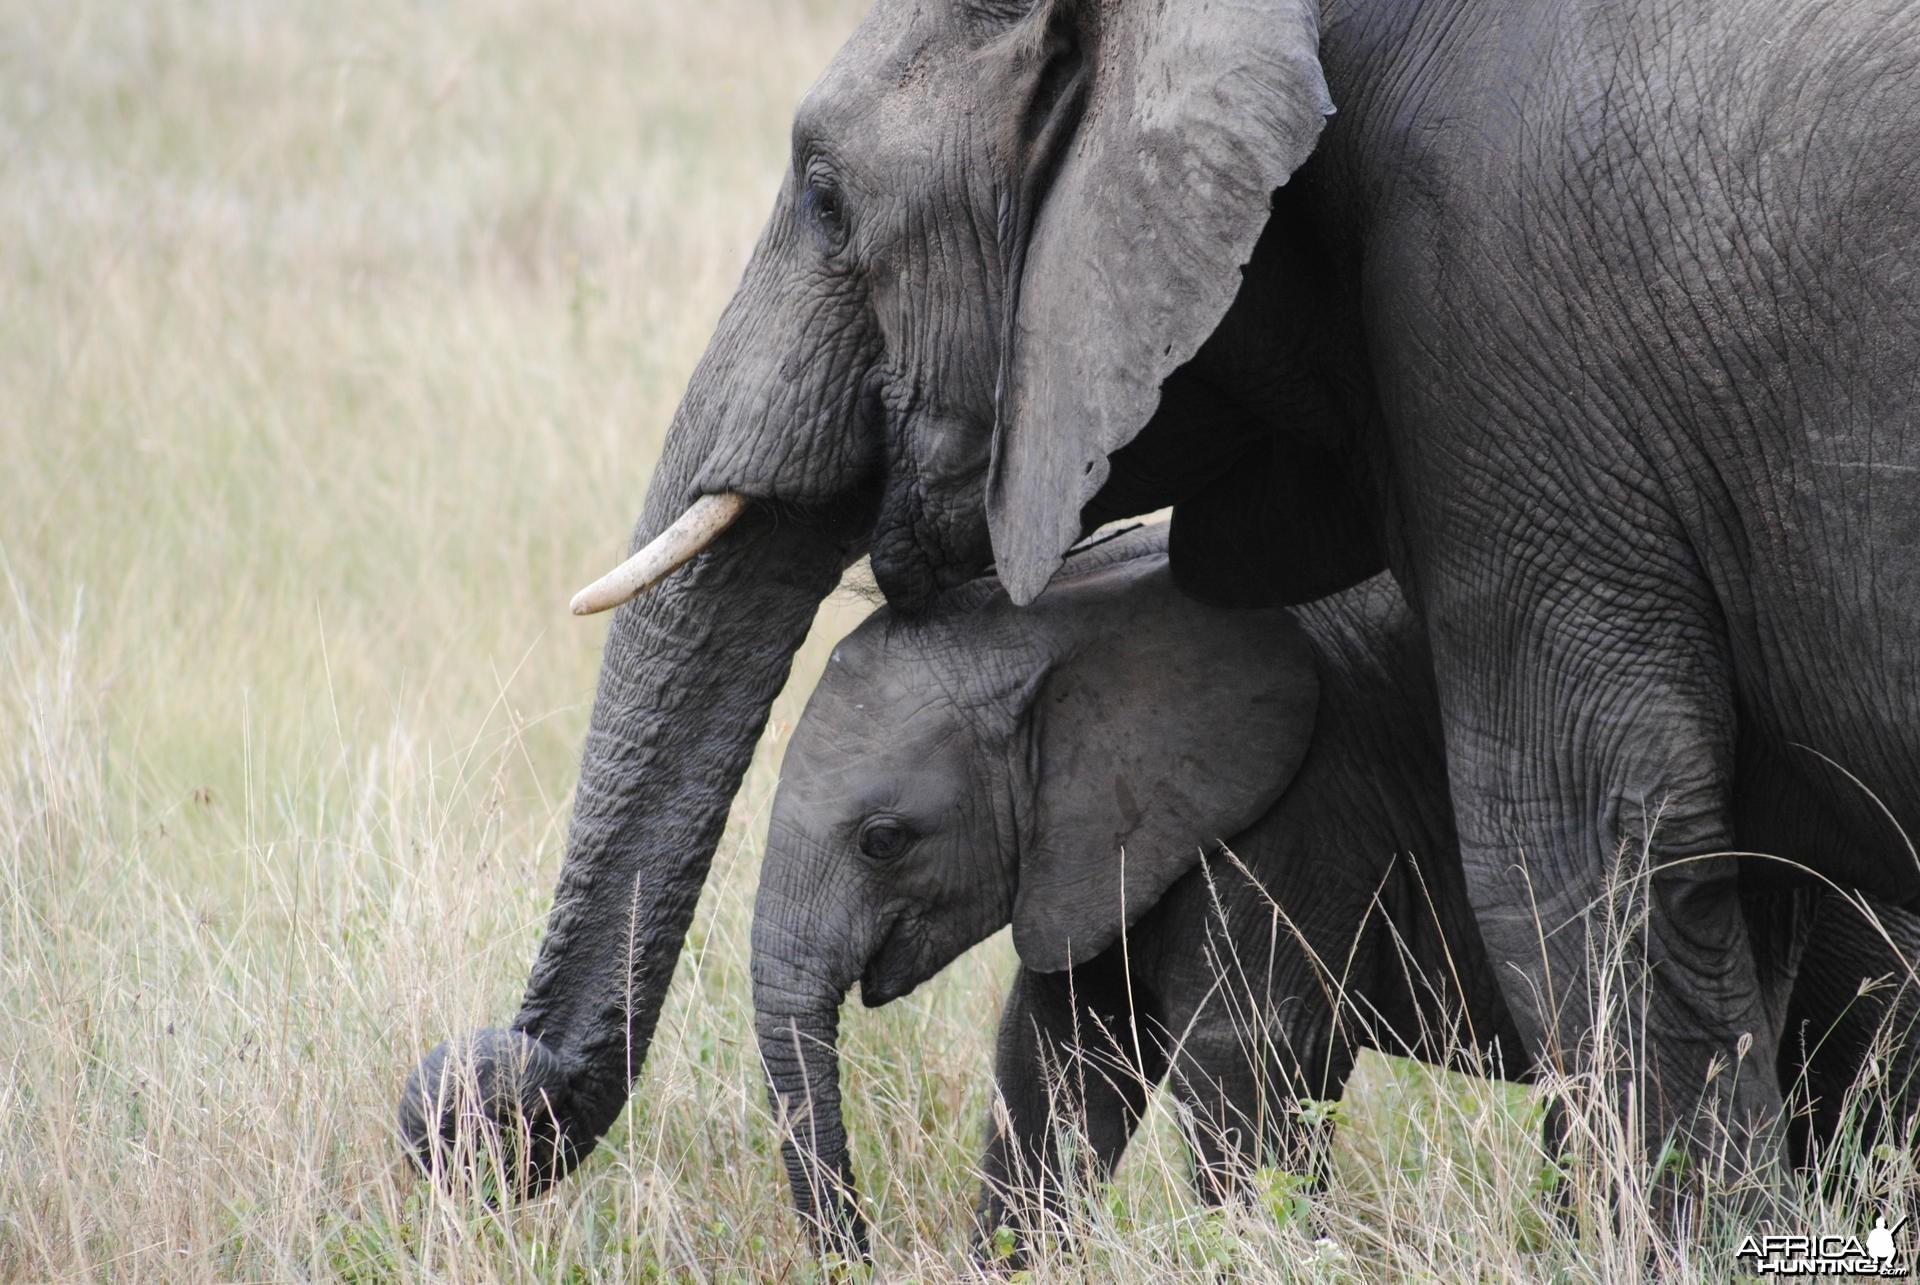 Elephant Masaai Mara in Kenya